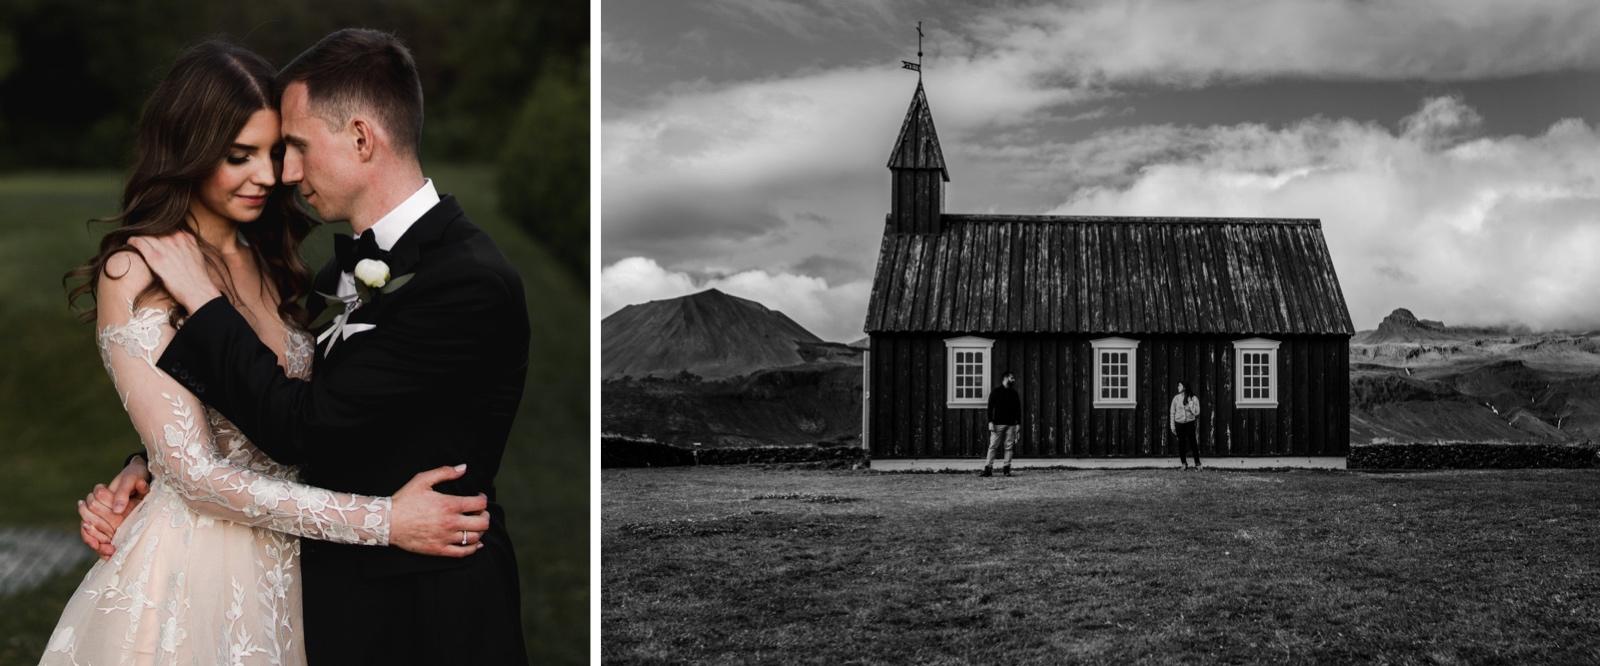 Fotomagoria Best 0f 2018 Wedding Photographer Italy20.jpg